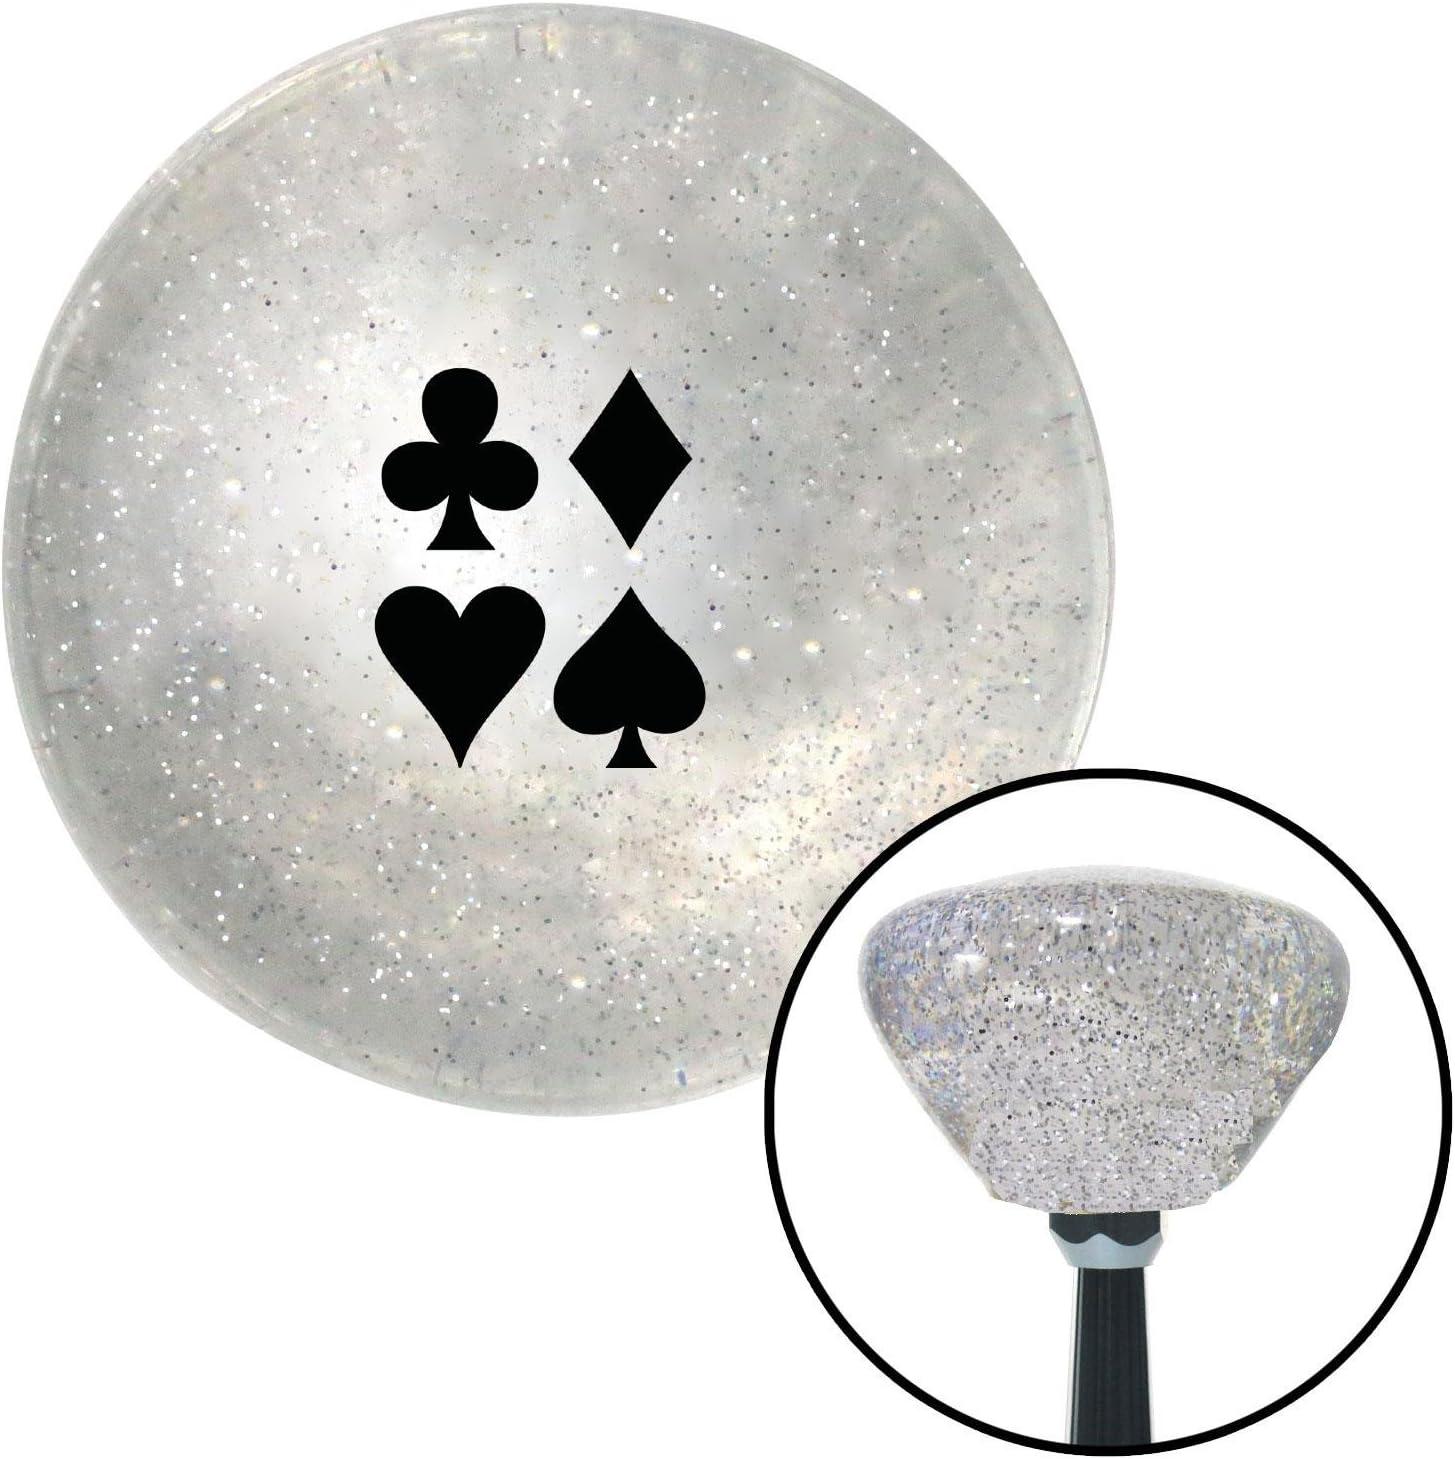 American Shifter 160471 Clear Retro Metal Flake Shift Knob with M16 x 1.5 Insert Black Clubs Diamond Heart Spades